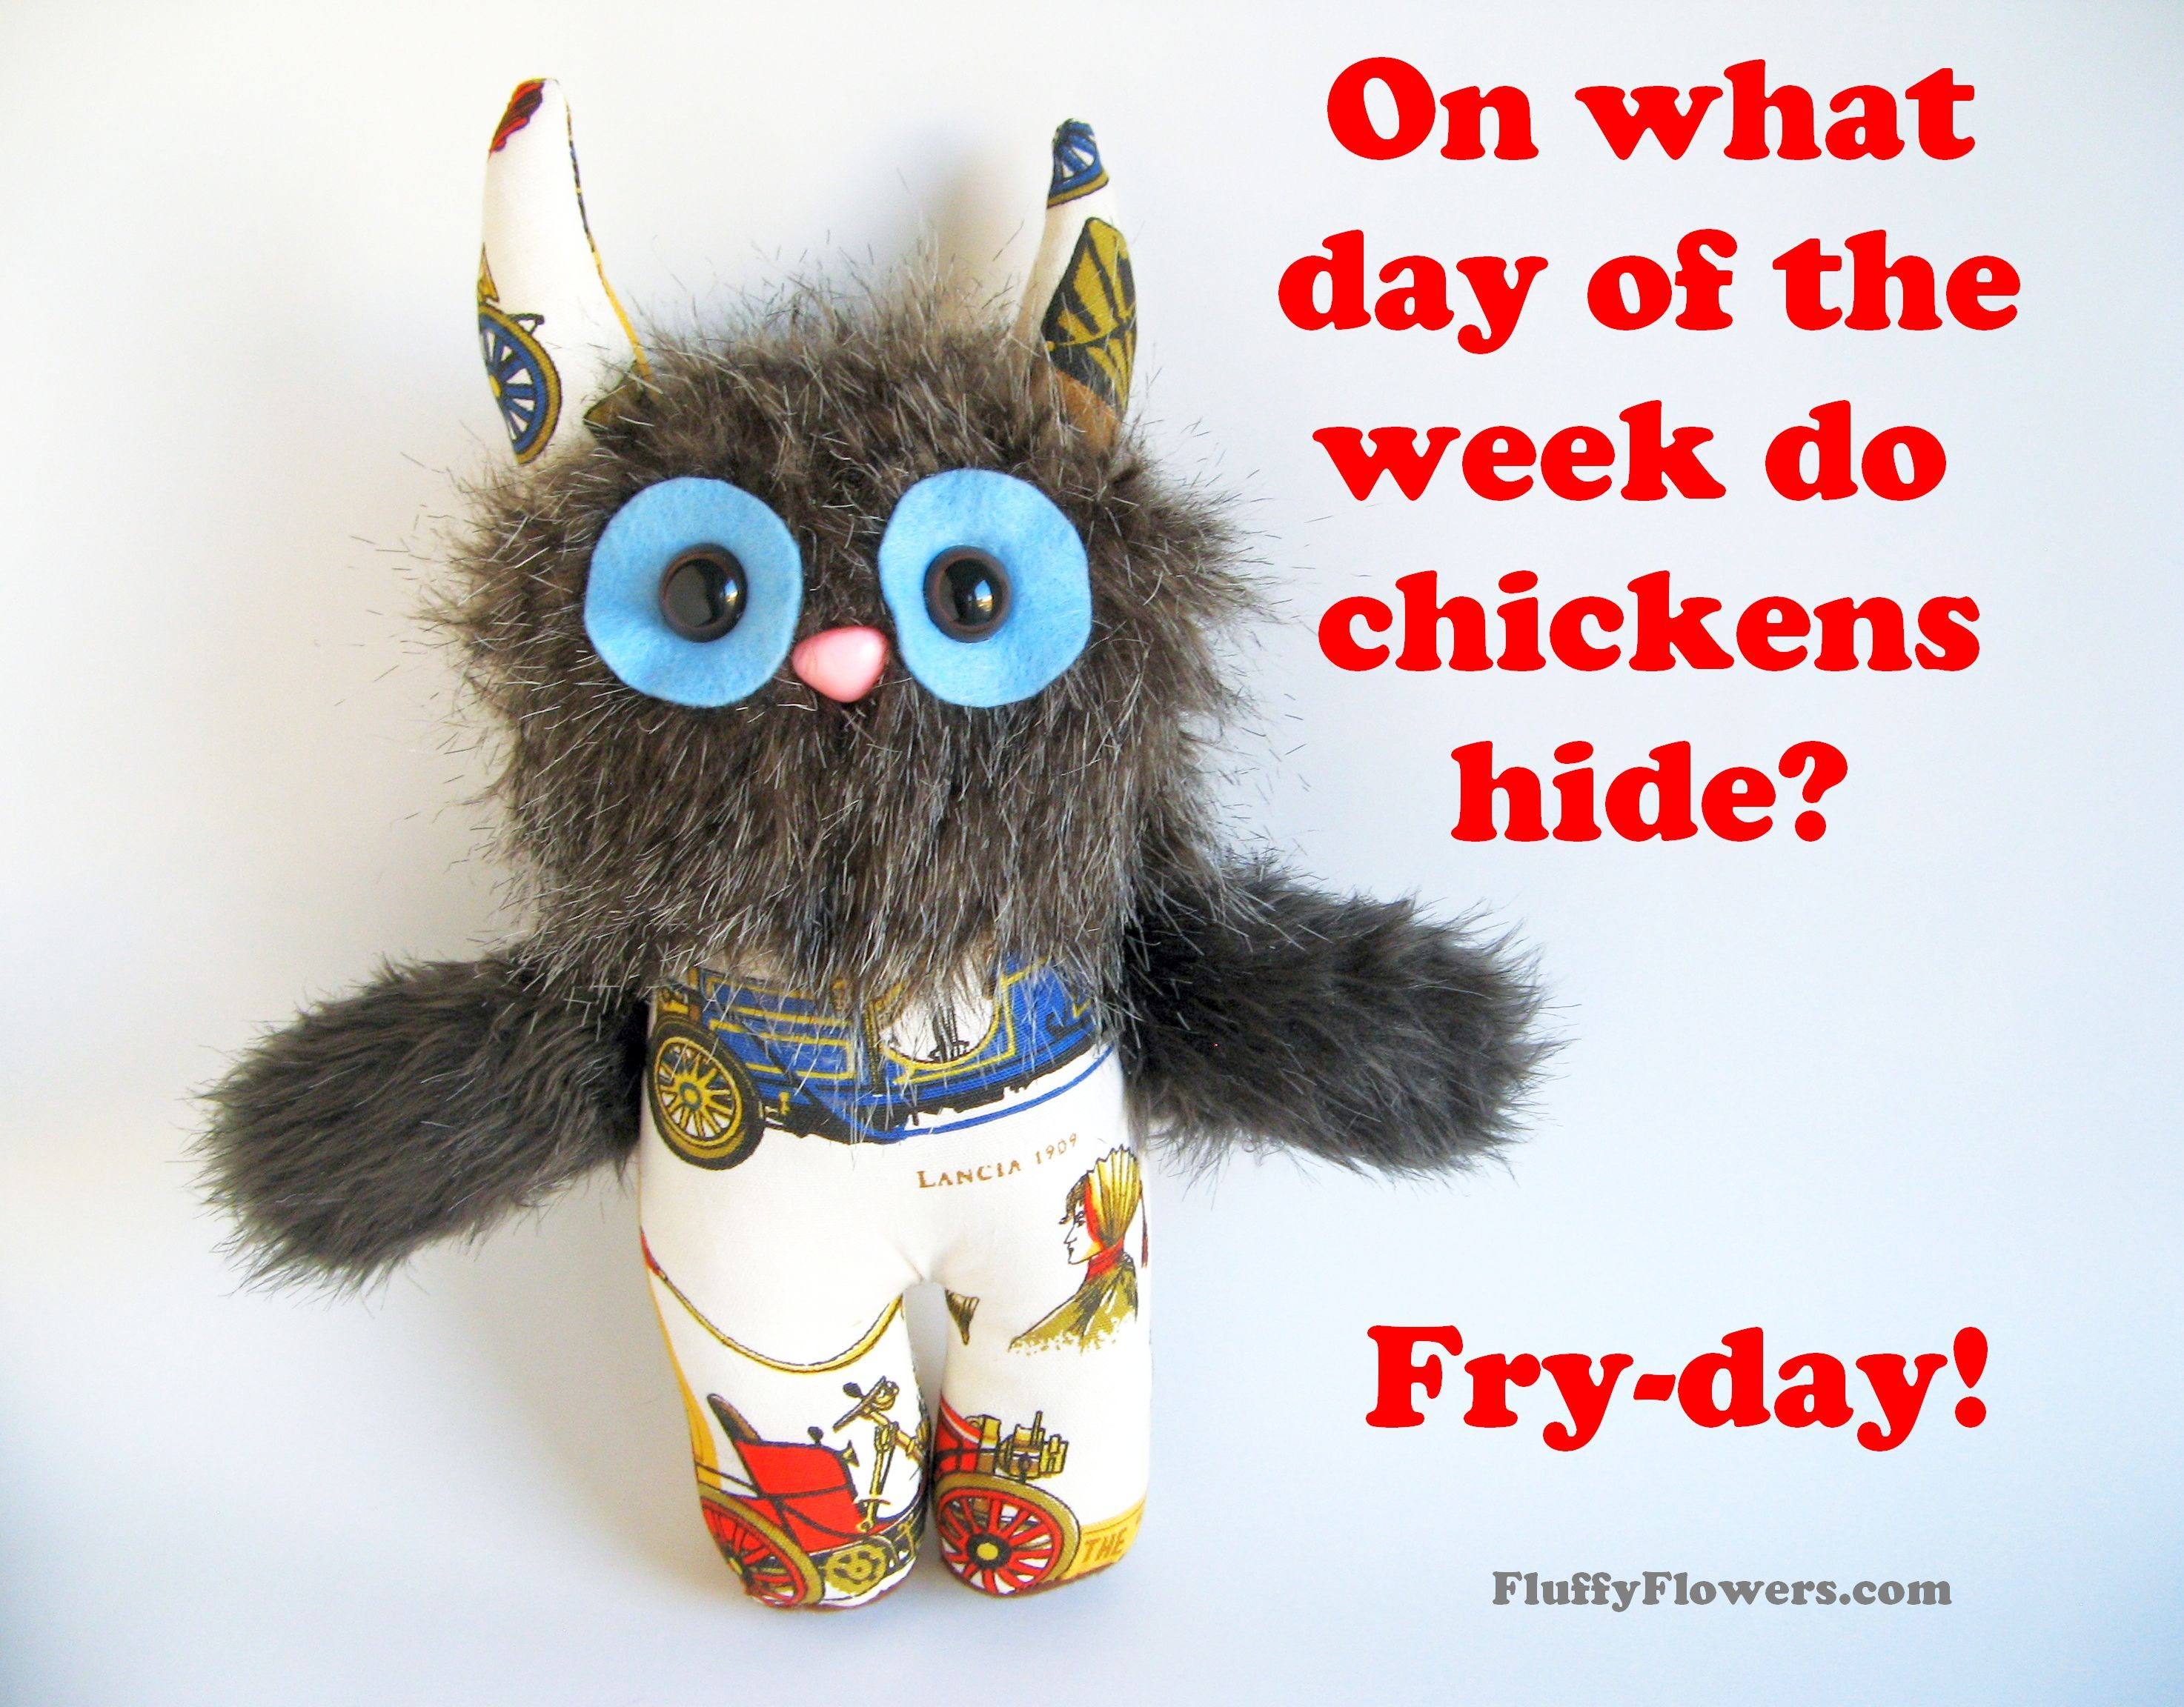 Cute Amp Clean Friday Chicken Joke For Children Featuring An